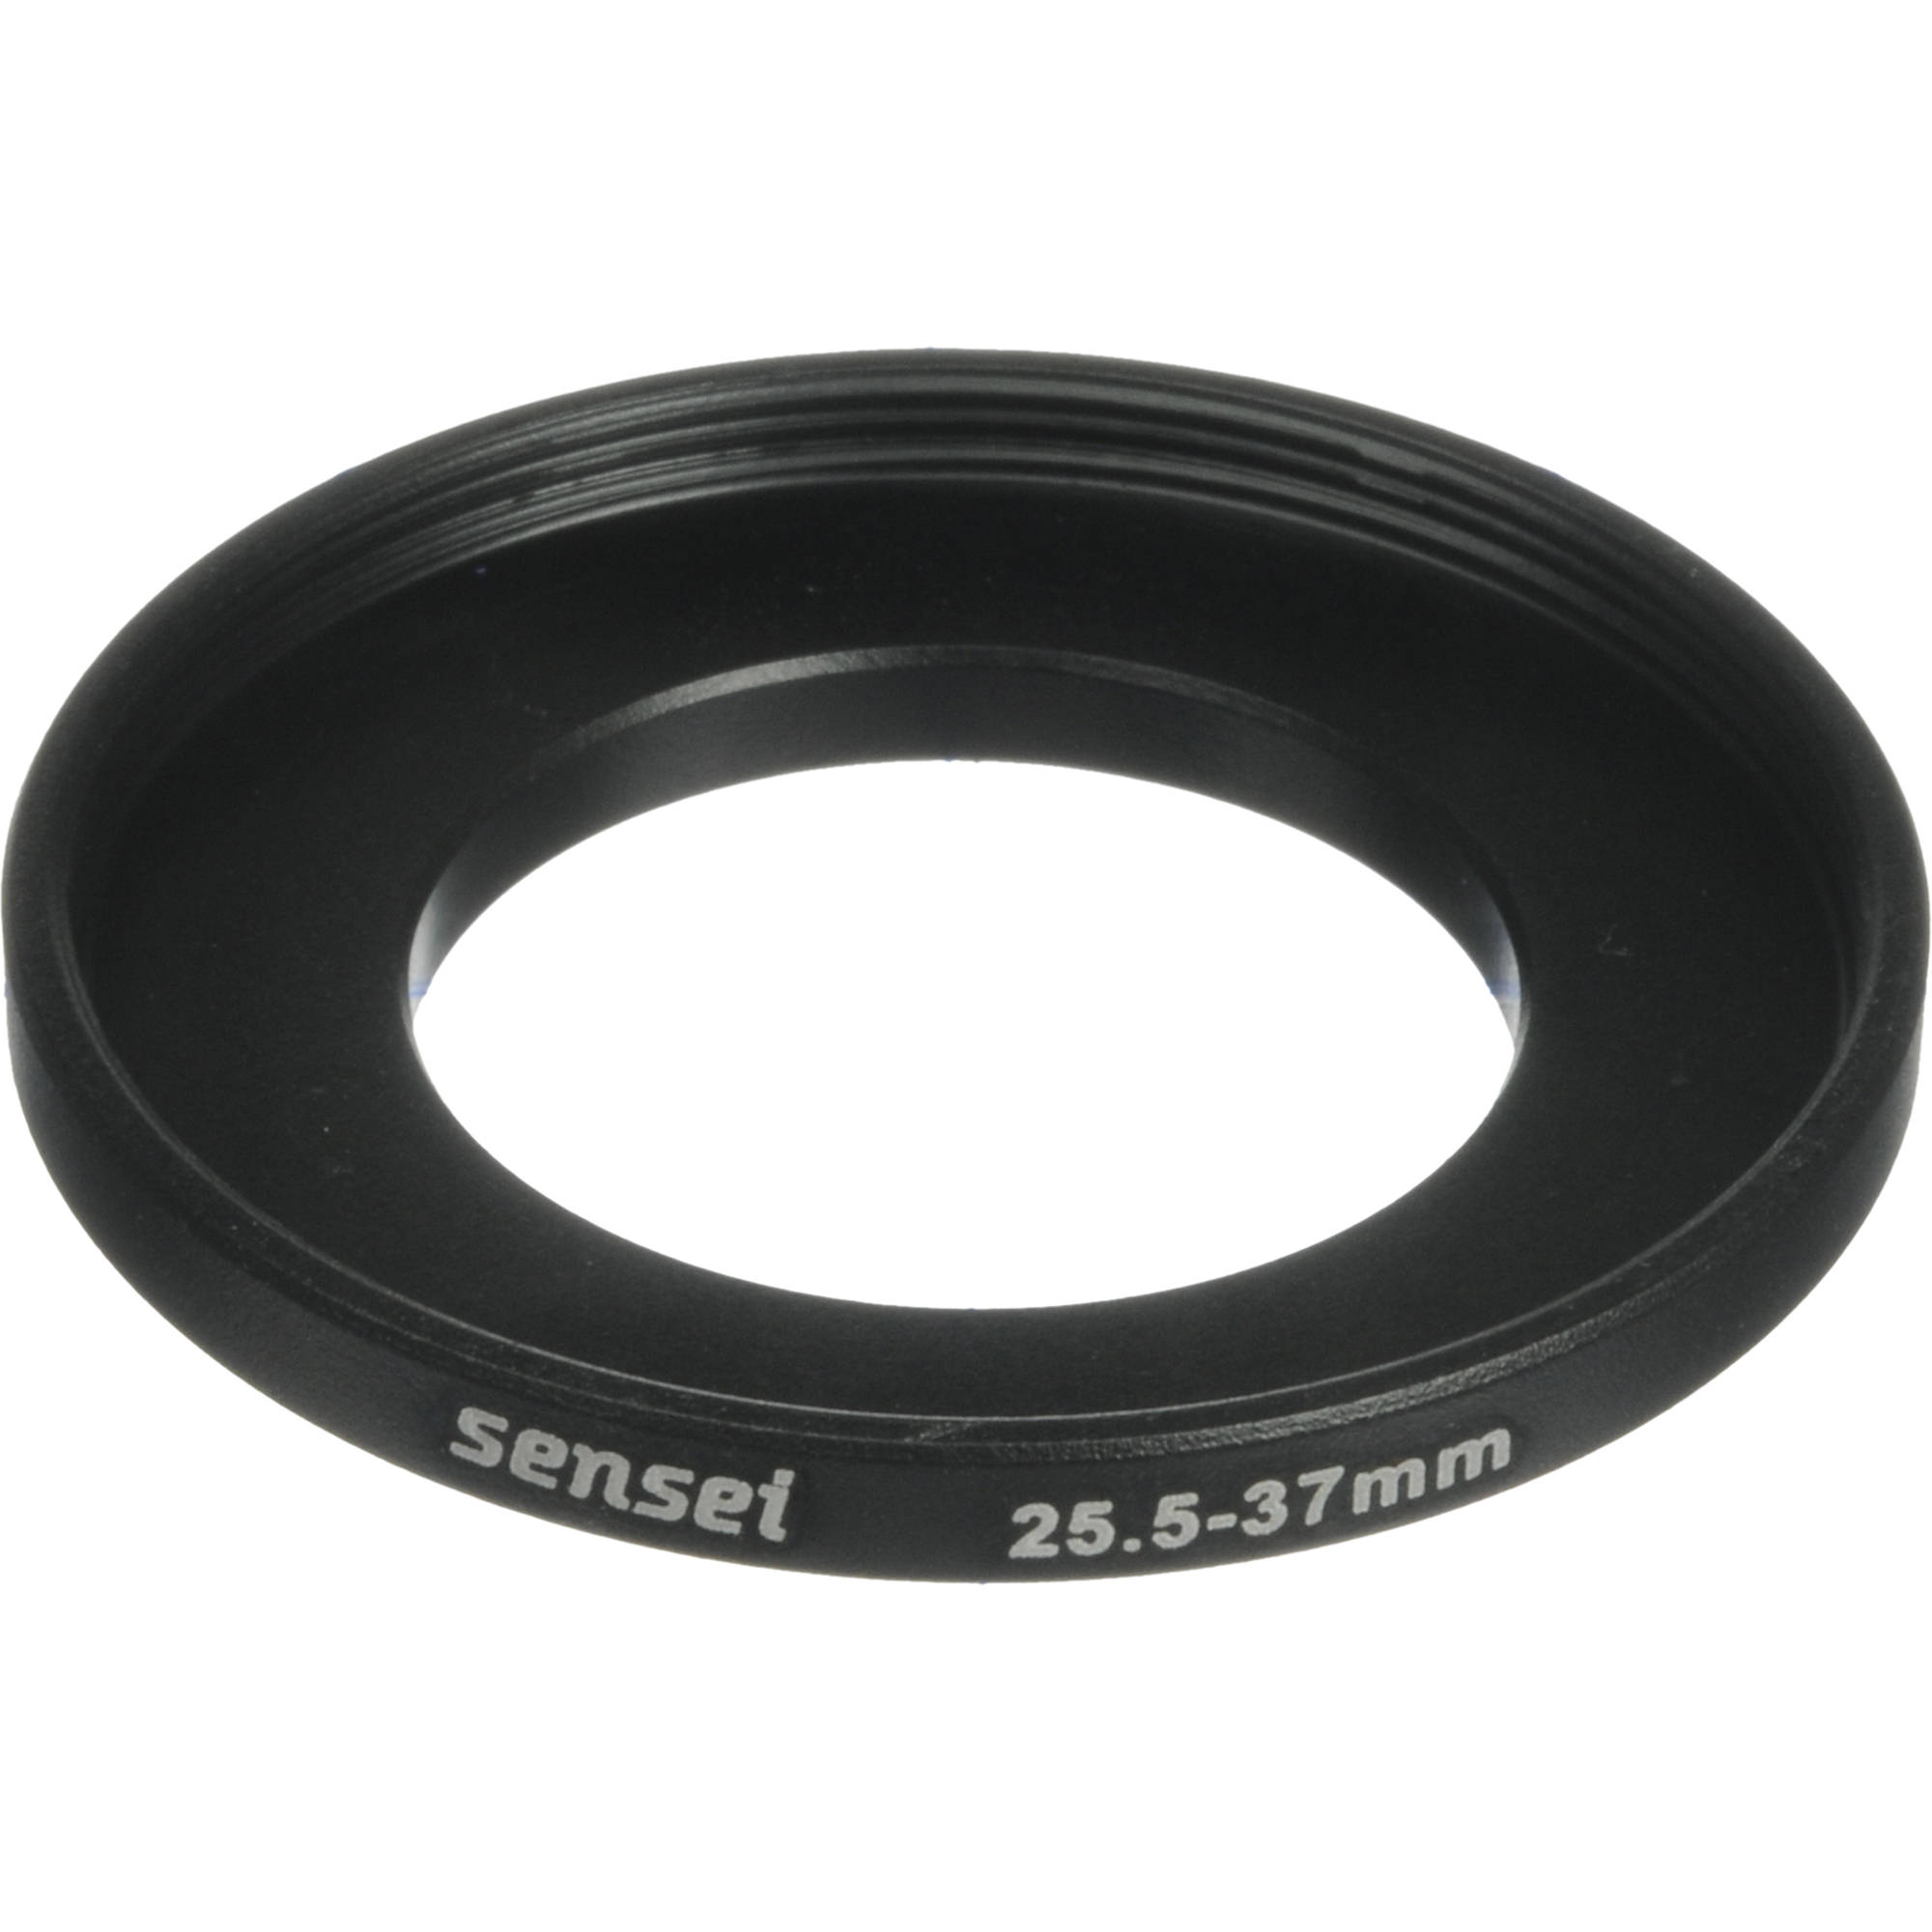 Sensei PRO 25.5-37mm Aluminum Step-Up Ring